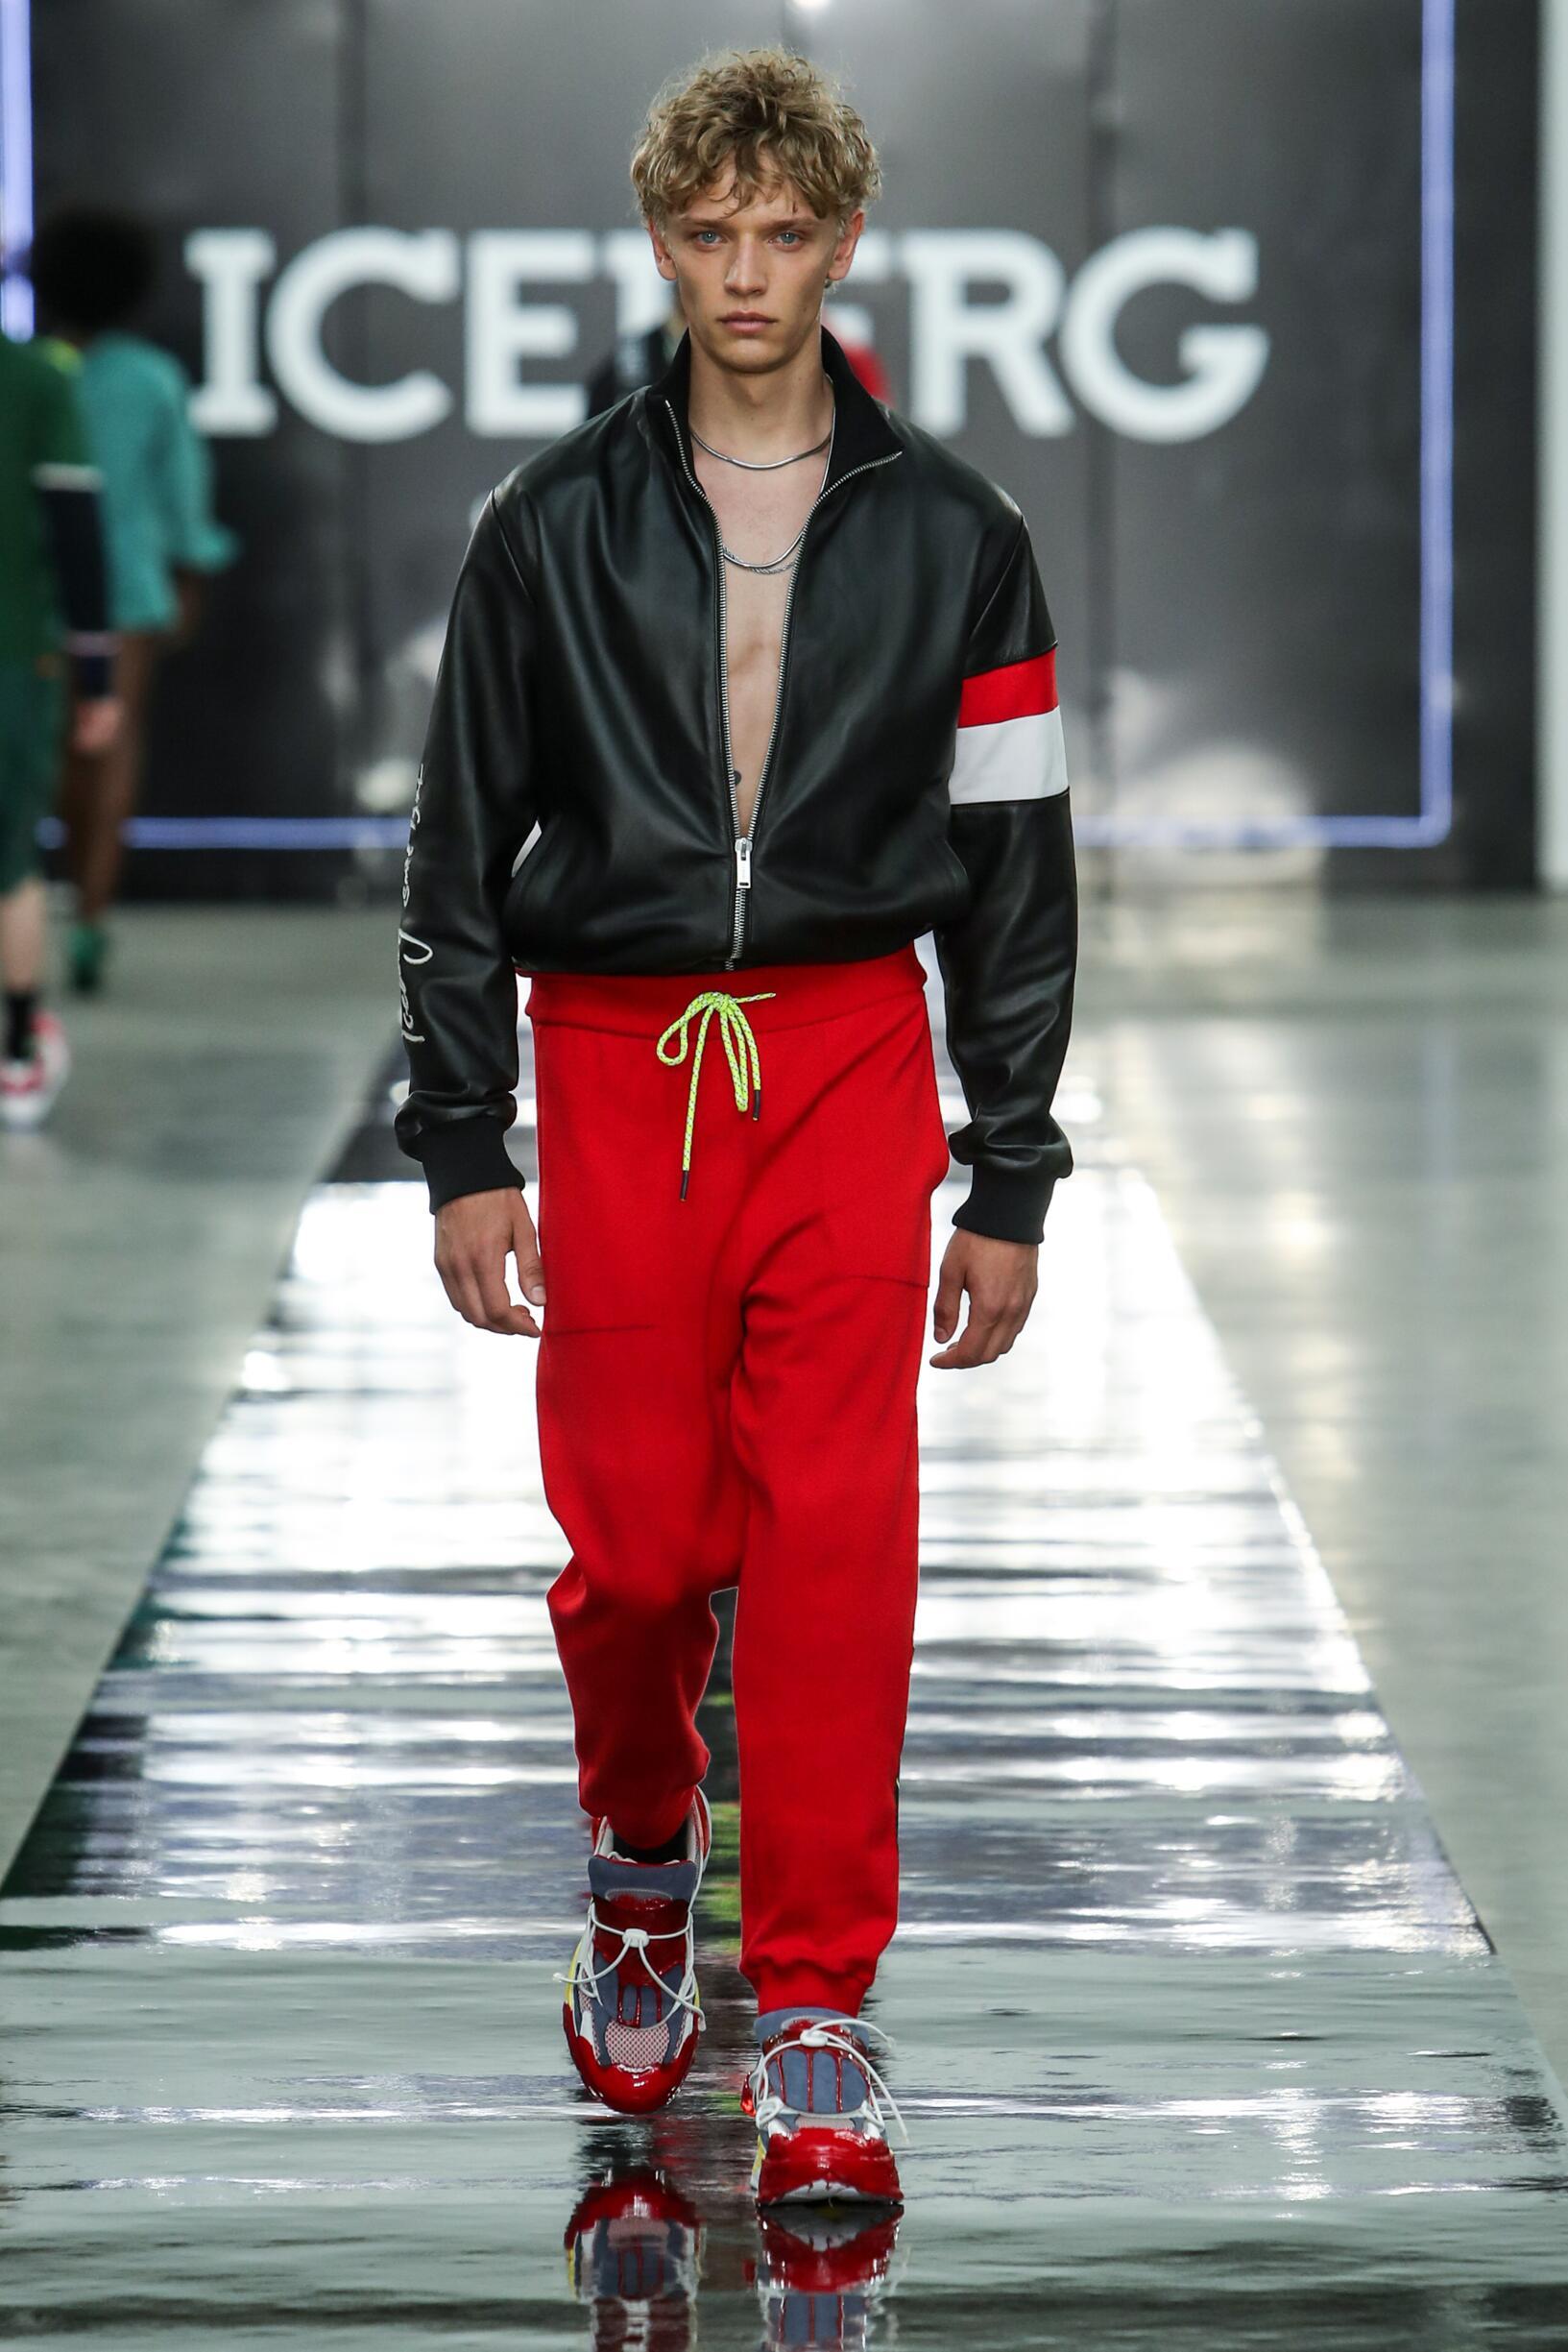 Catwalk Iceberg Man Fashion Show Summer 2020